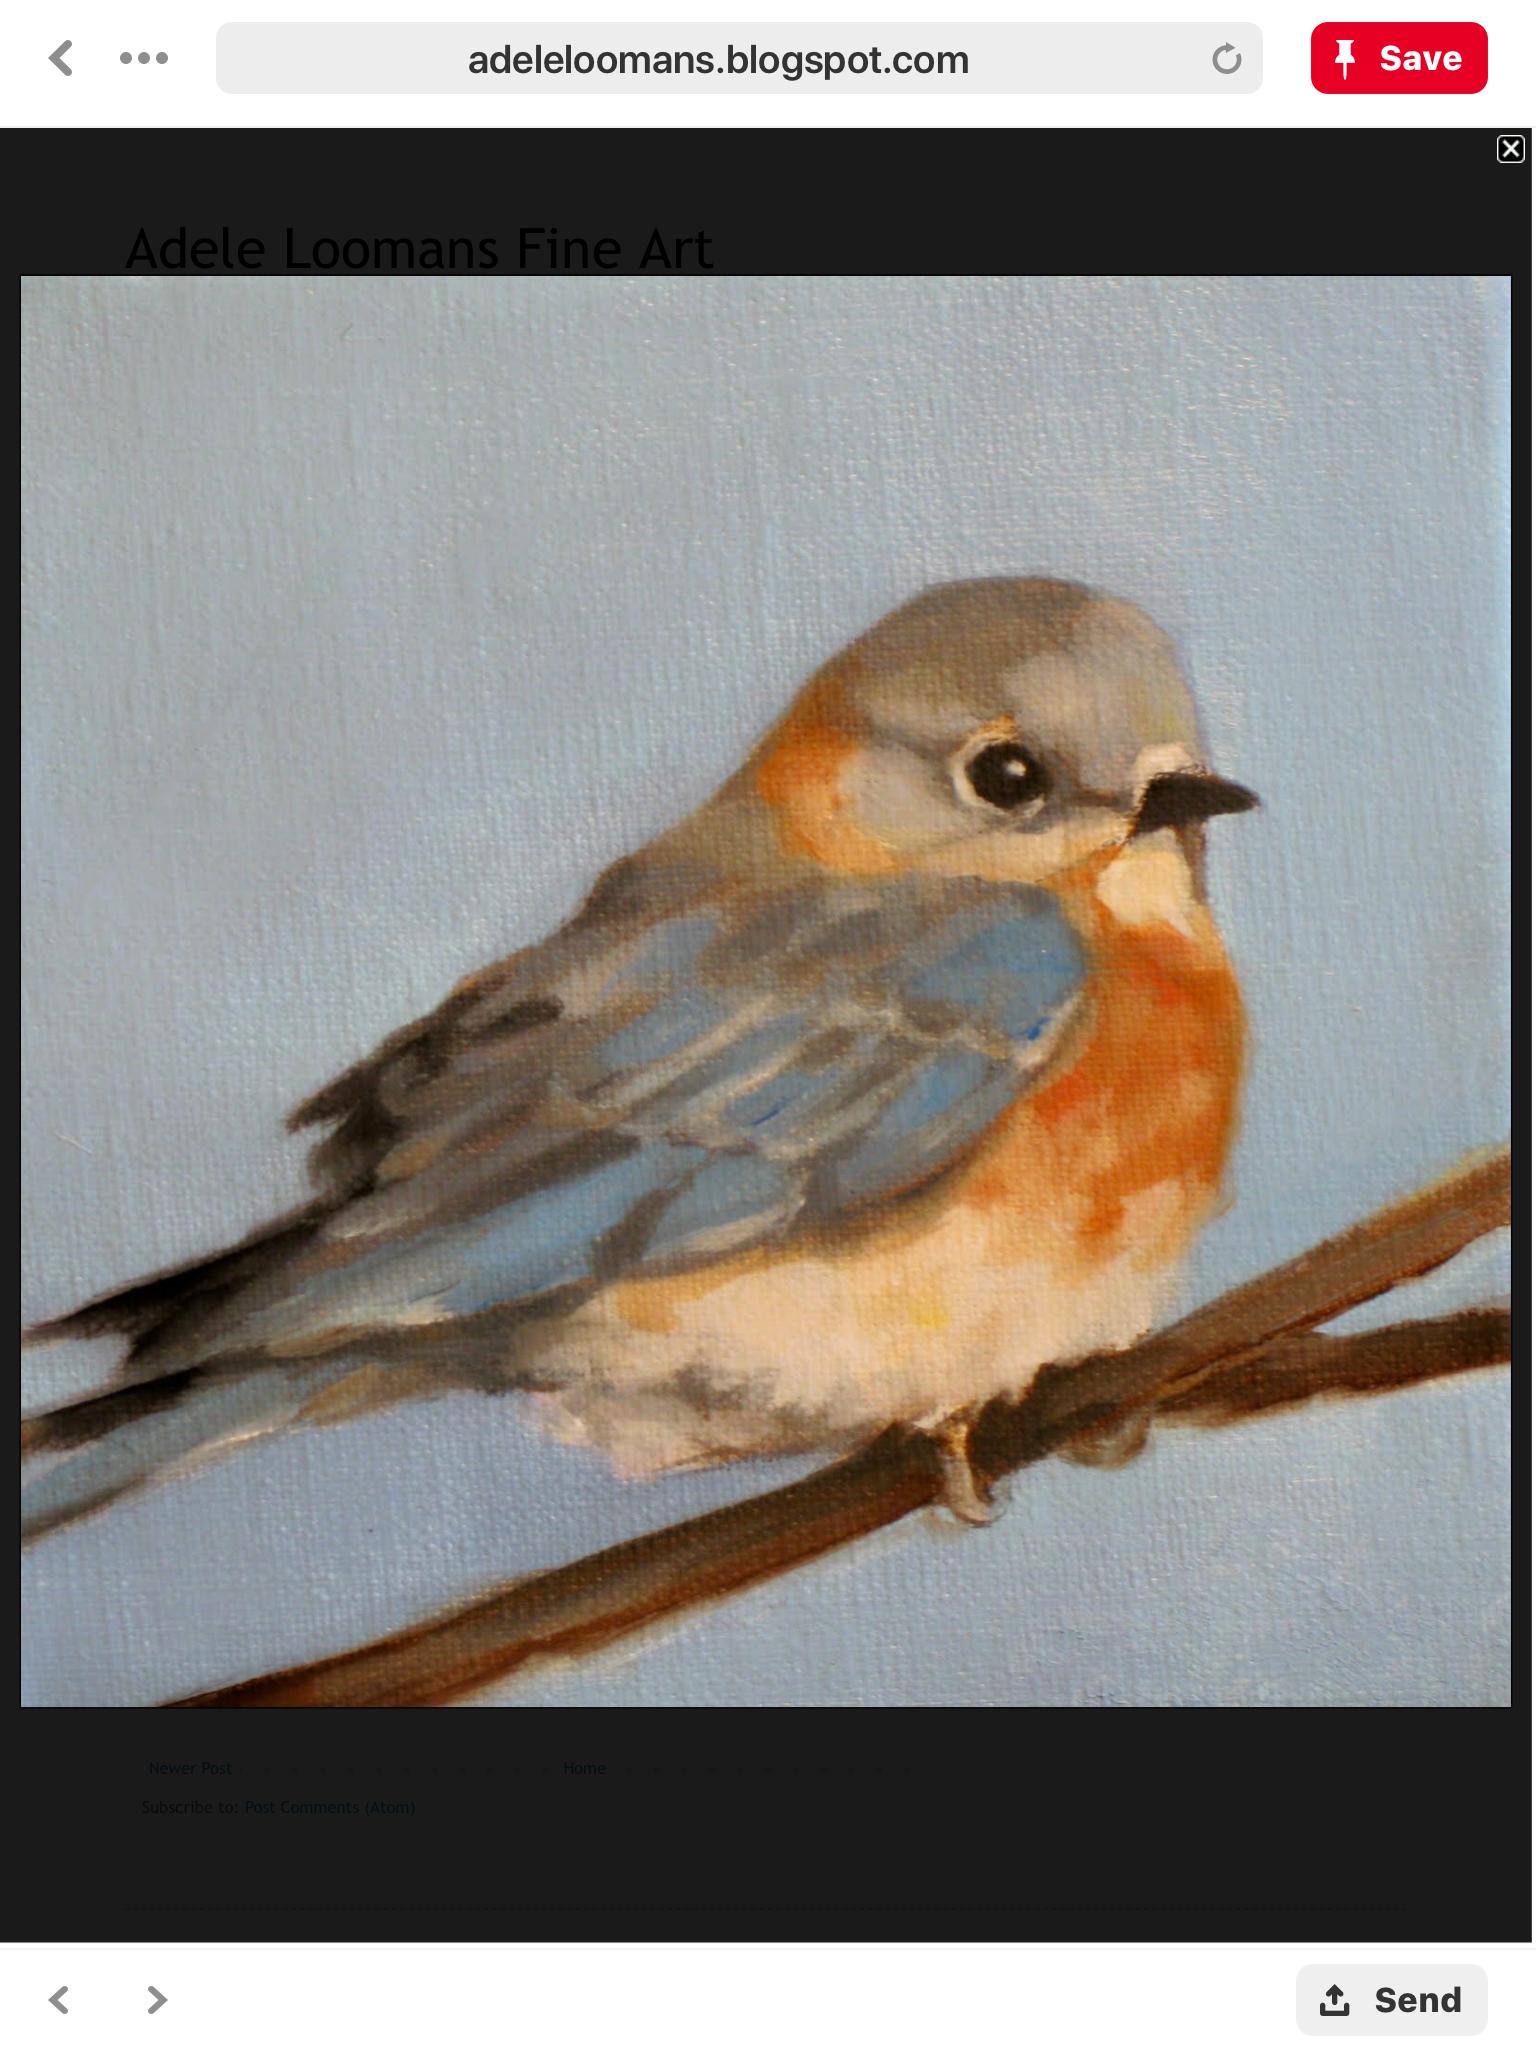 Solitario Uccelli Dipinti Arte Con Uccelli Uccello Ad Acquerello